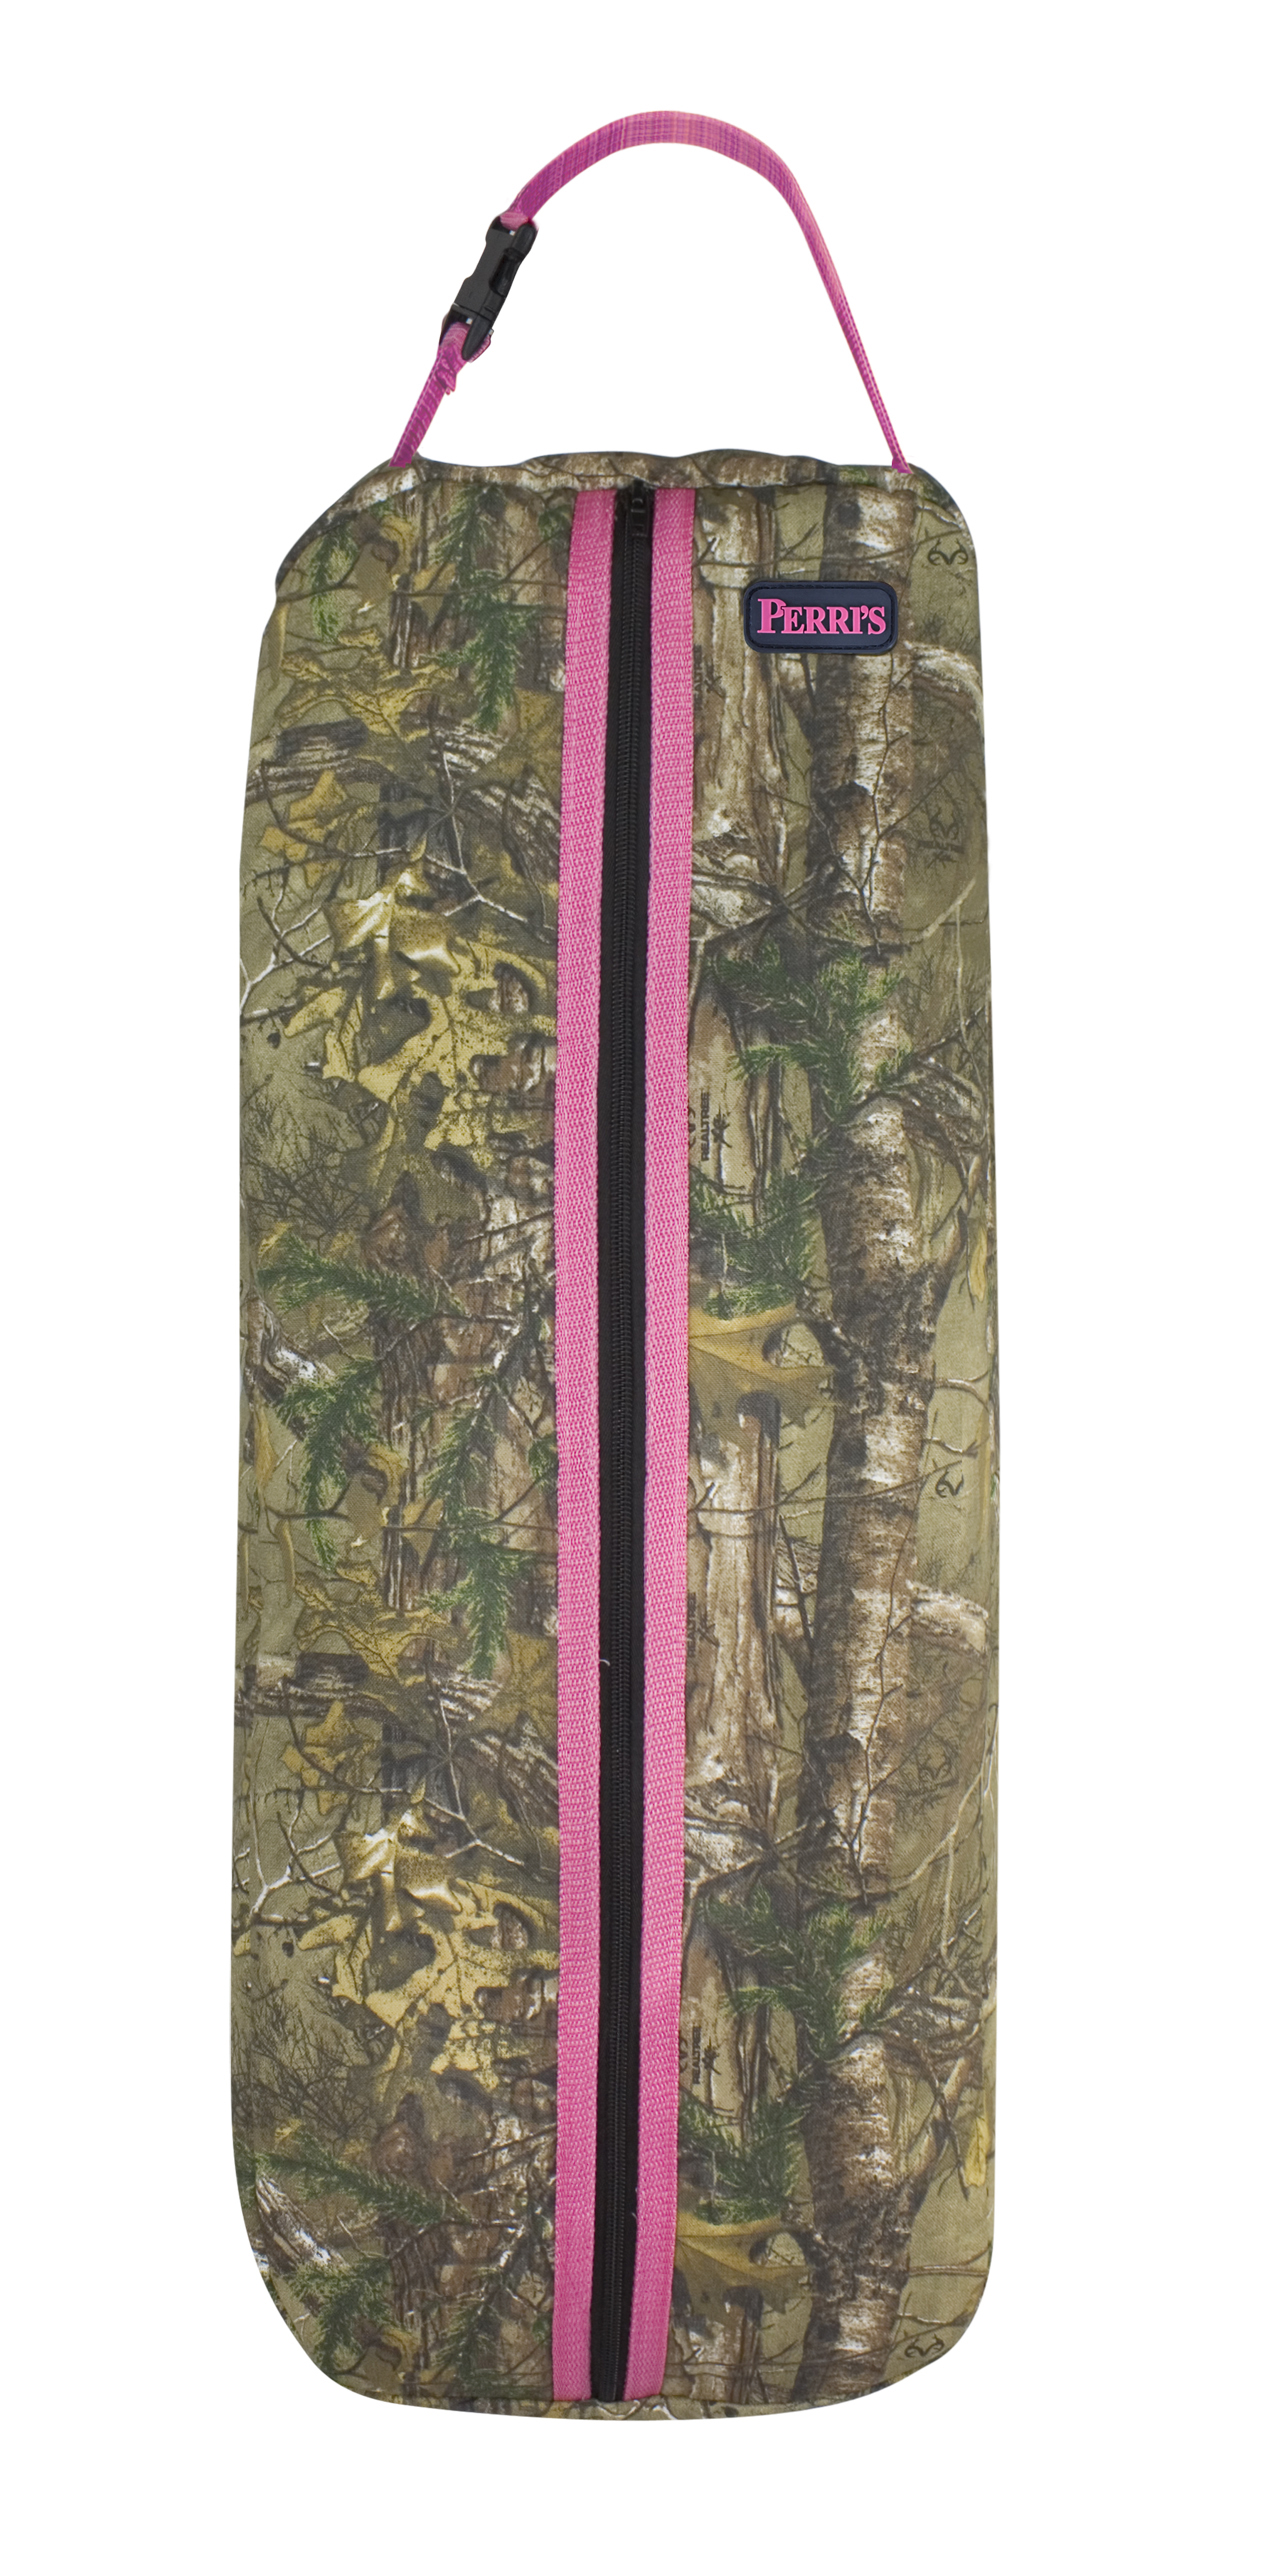 Real Tree Bridle Bag